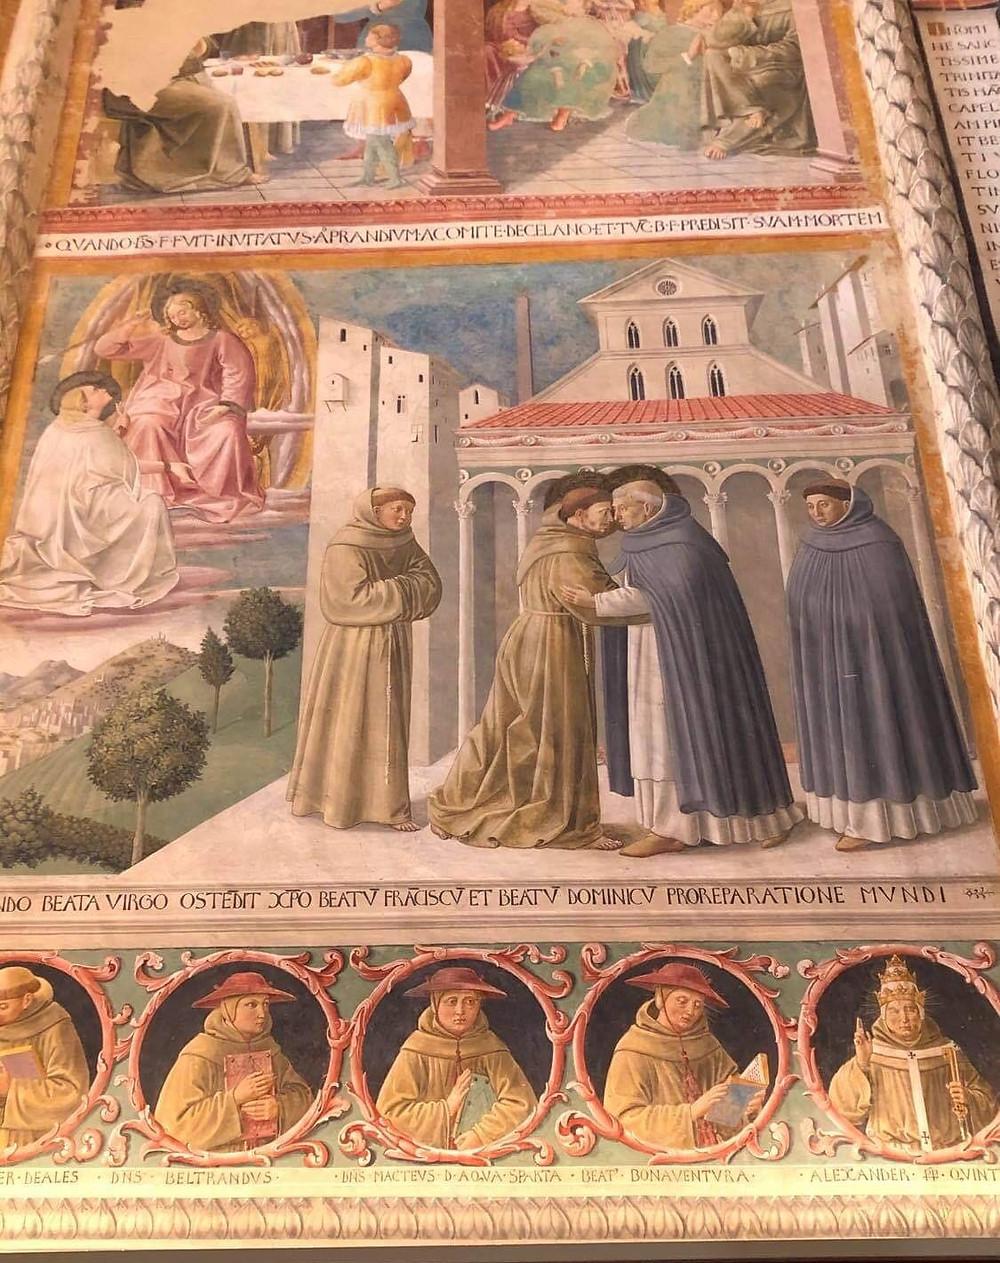 Genya Gritchin visits Benozzo Gozzoli in Italy.